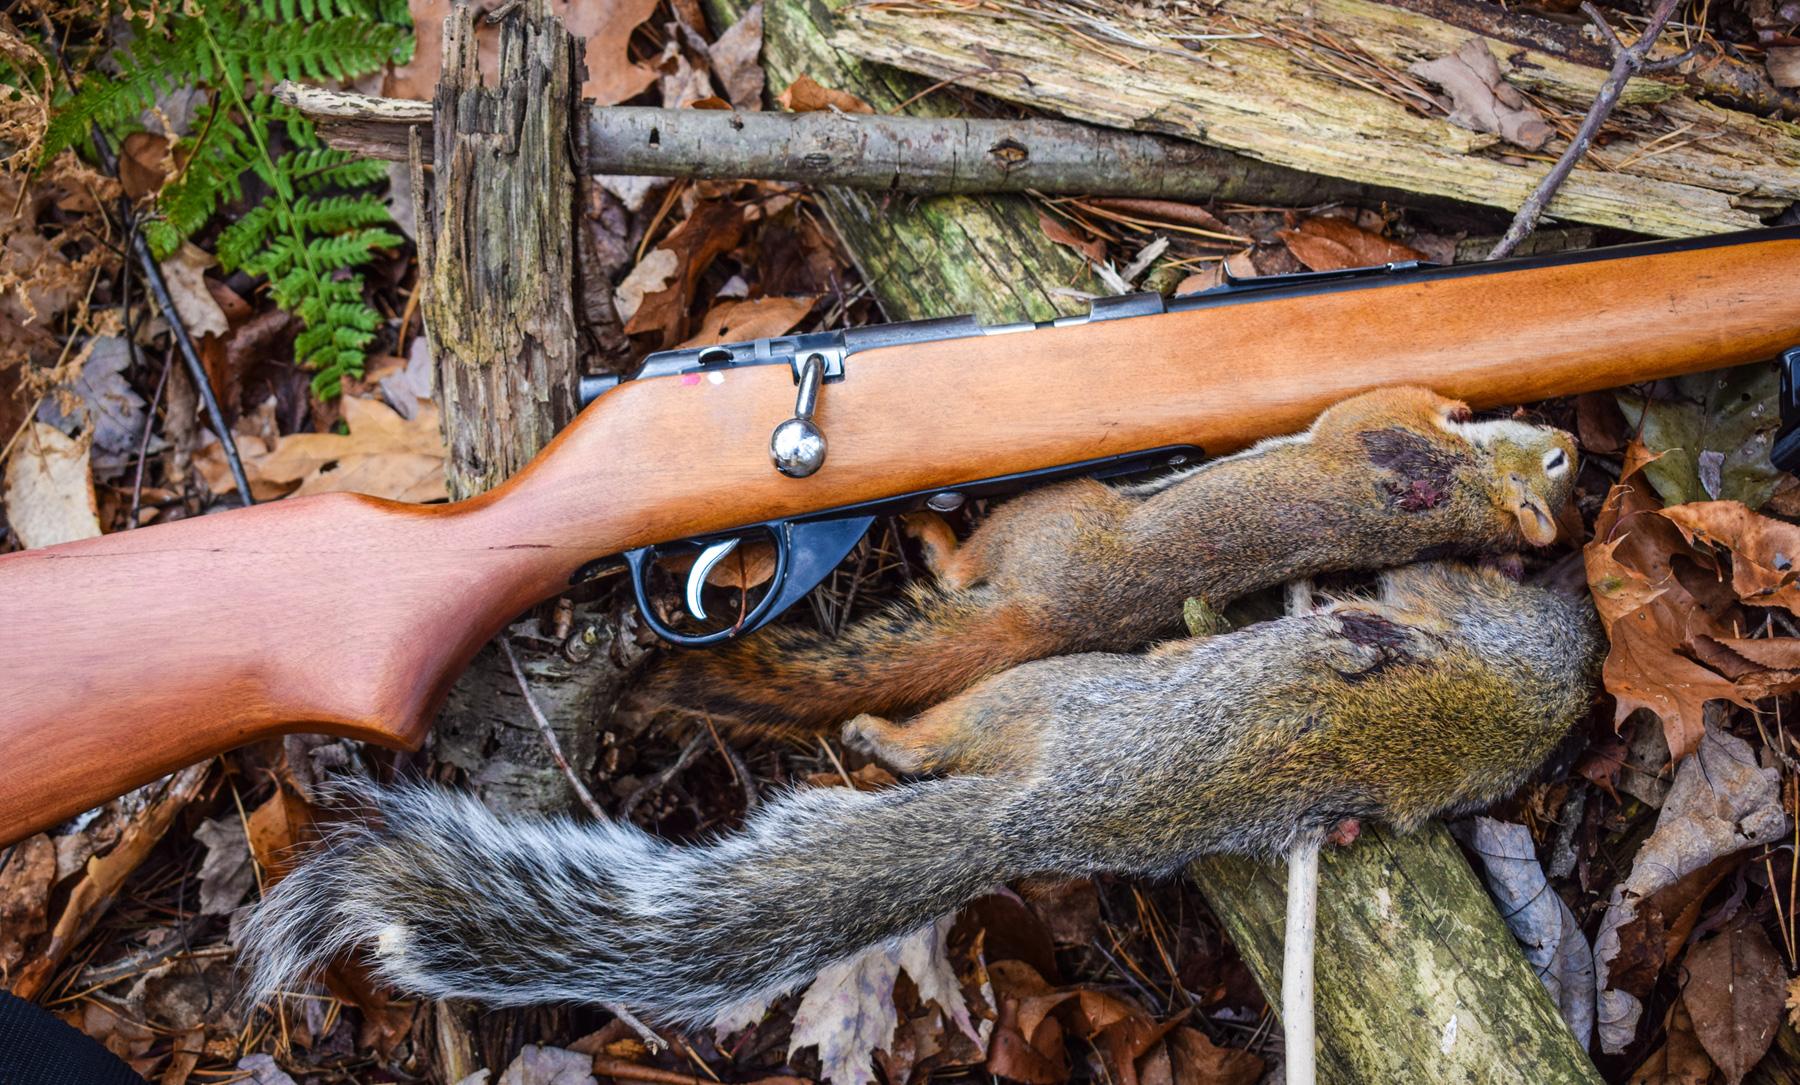 Varmint Laying Next to Rifle